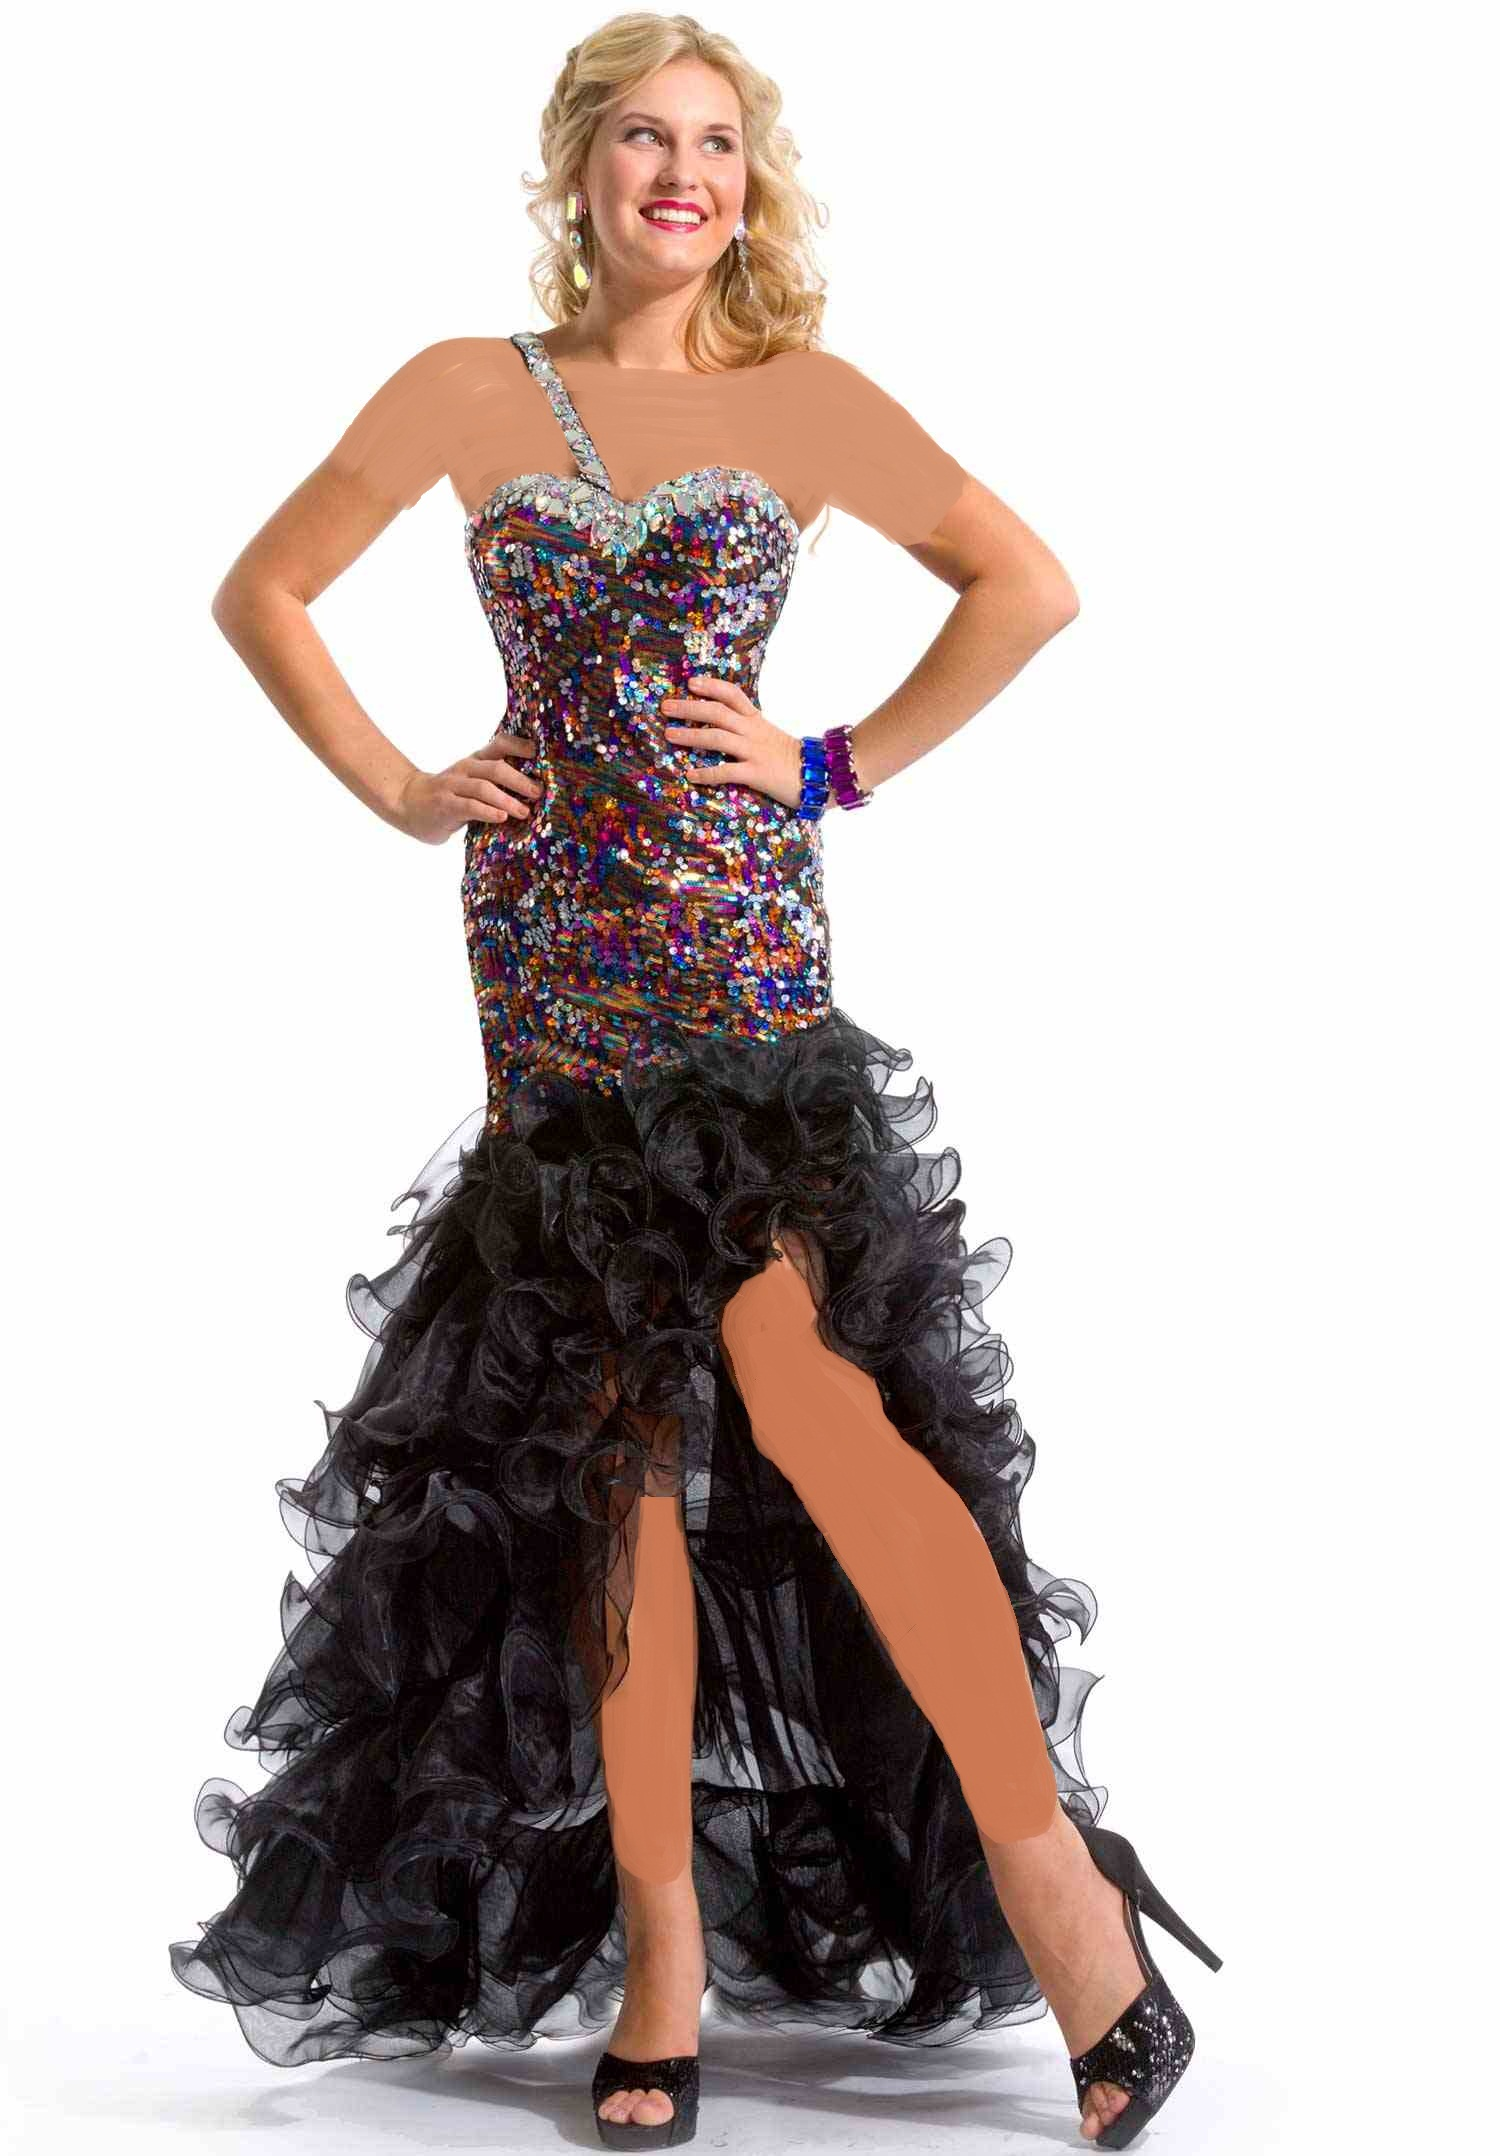 http://campsa.rzb.ir-مدل لباس کوتاه فوق العاده شیک زنانه